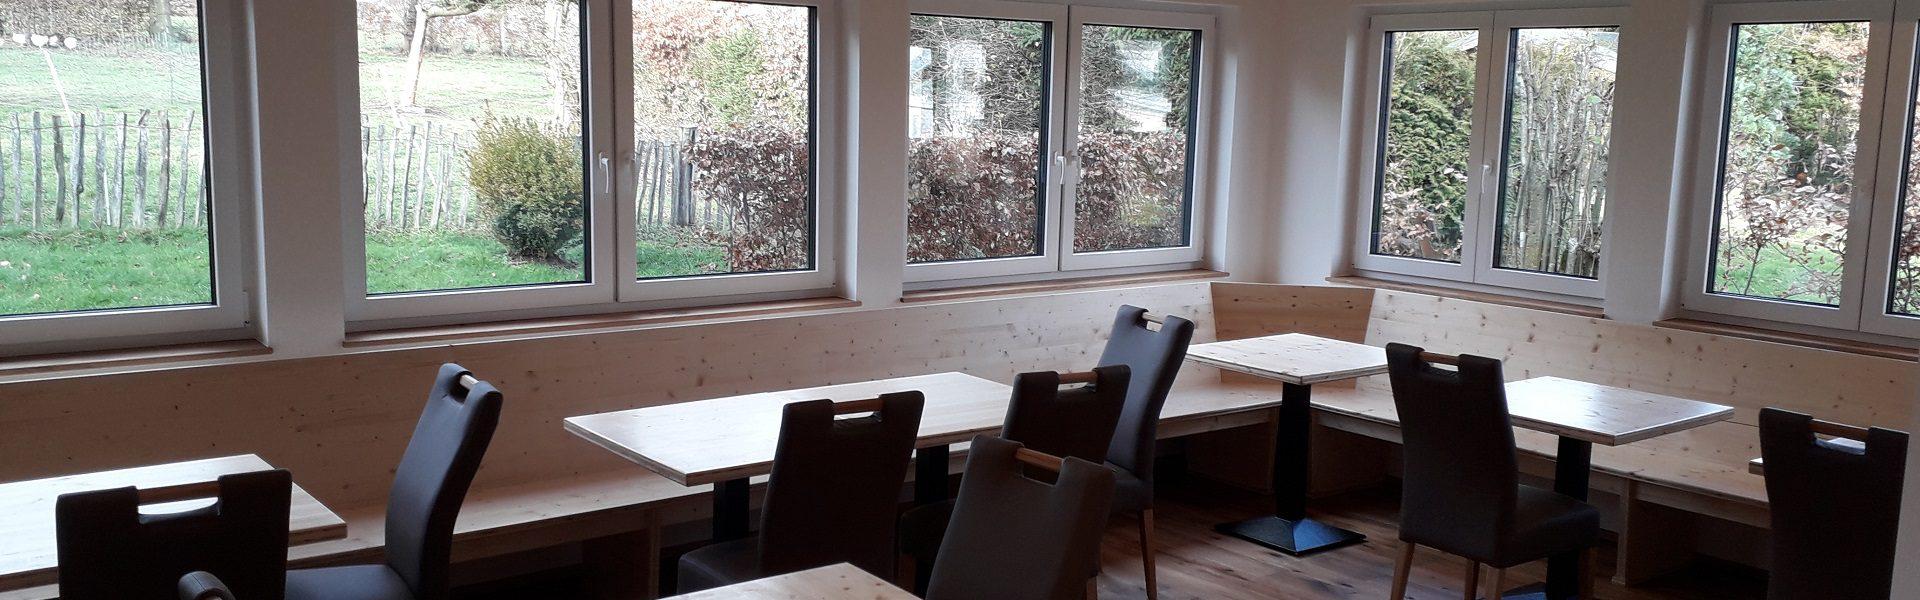 Frühstücksraum Stand 05.01.2021